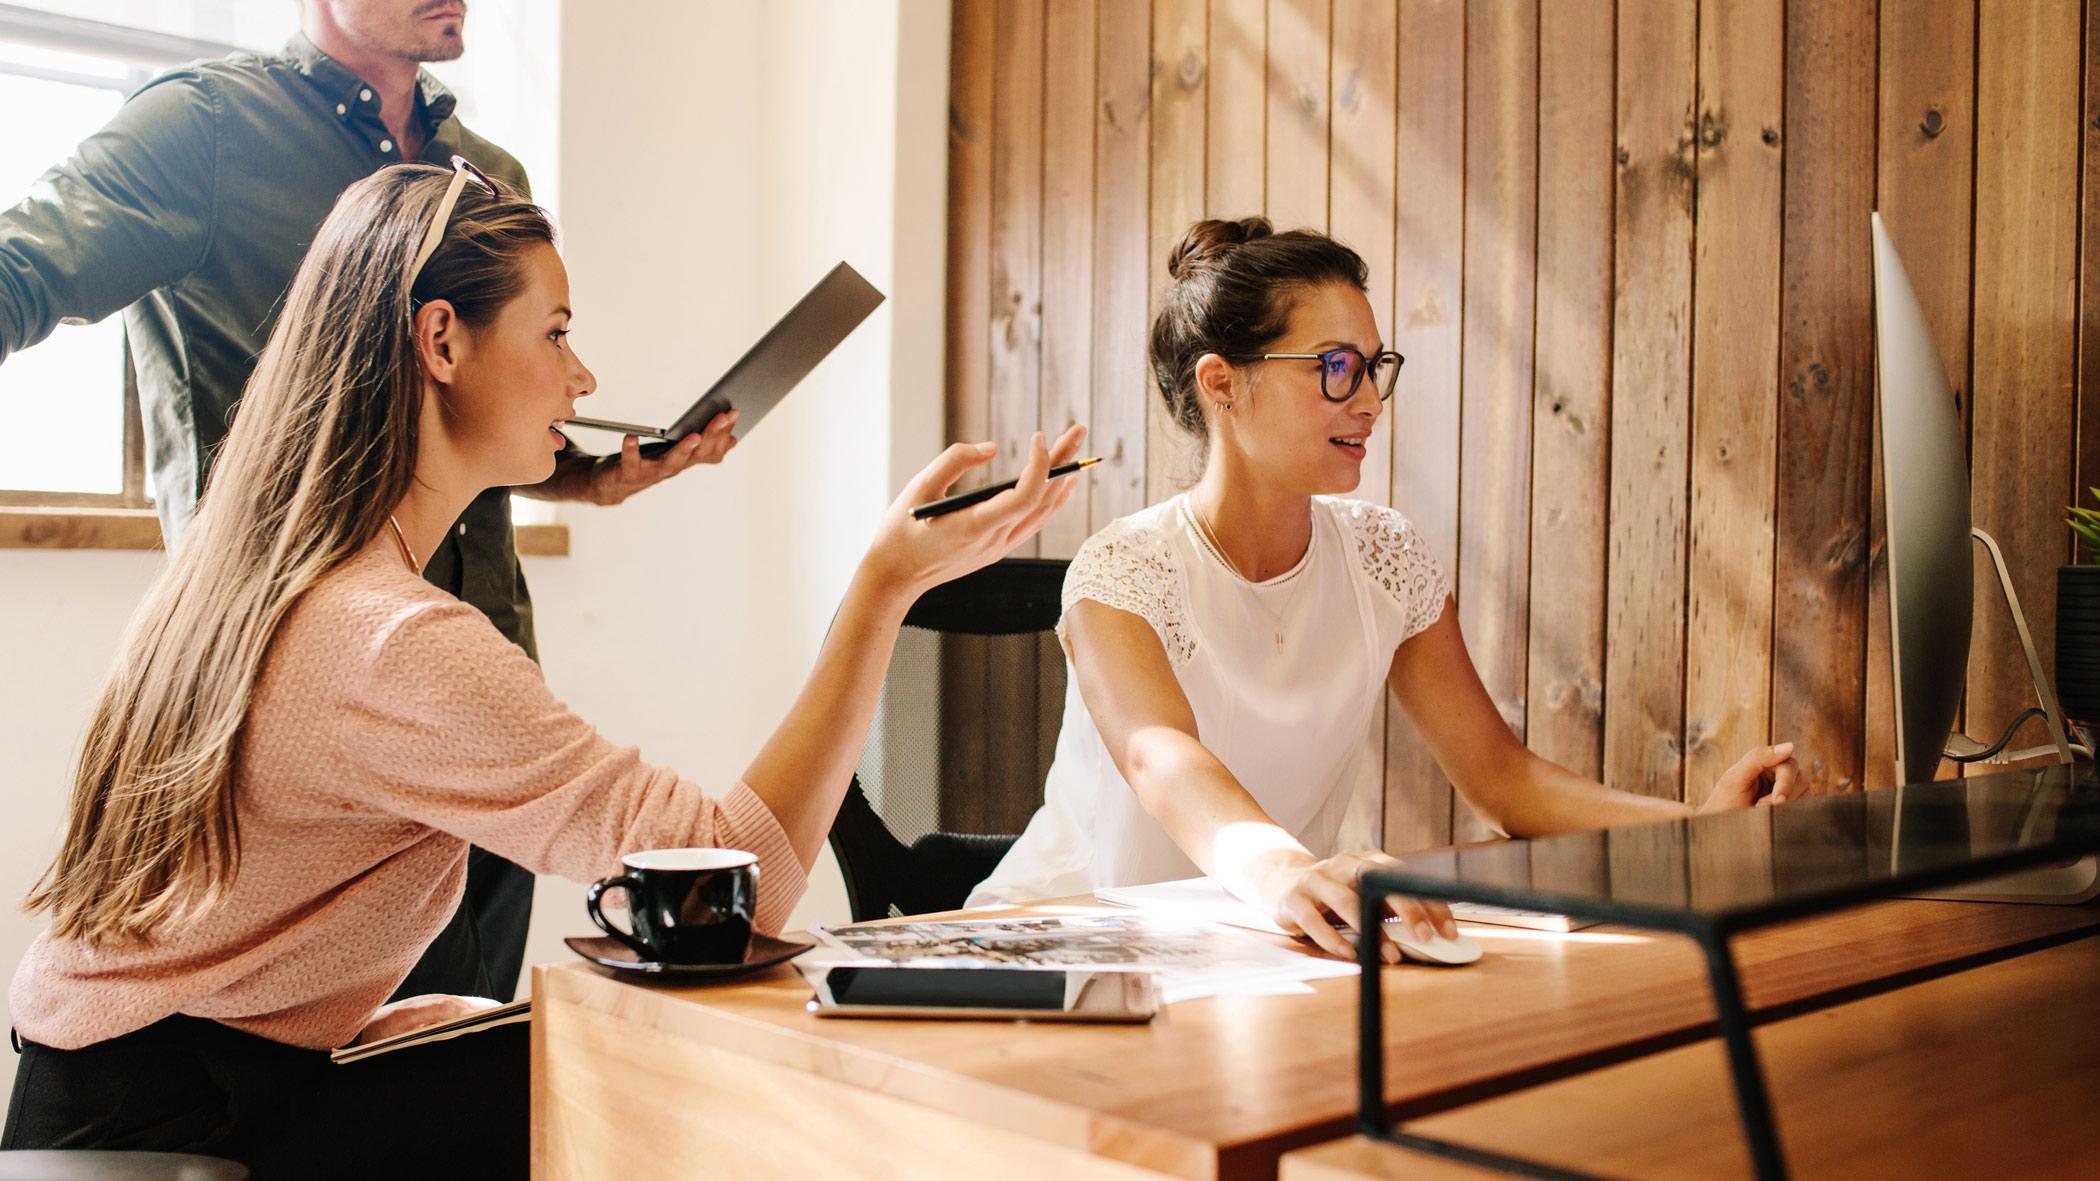 UNWTO Changemakers: Female entrepreneurs driving the SDGS